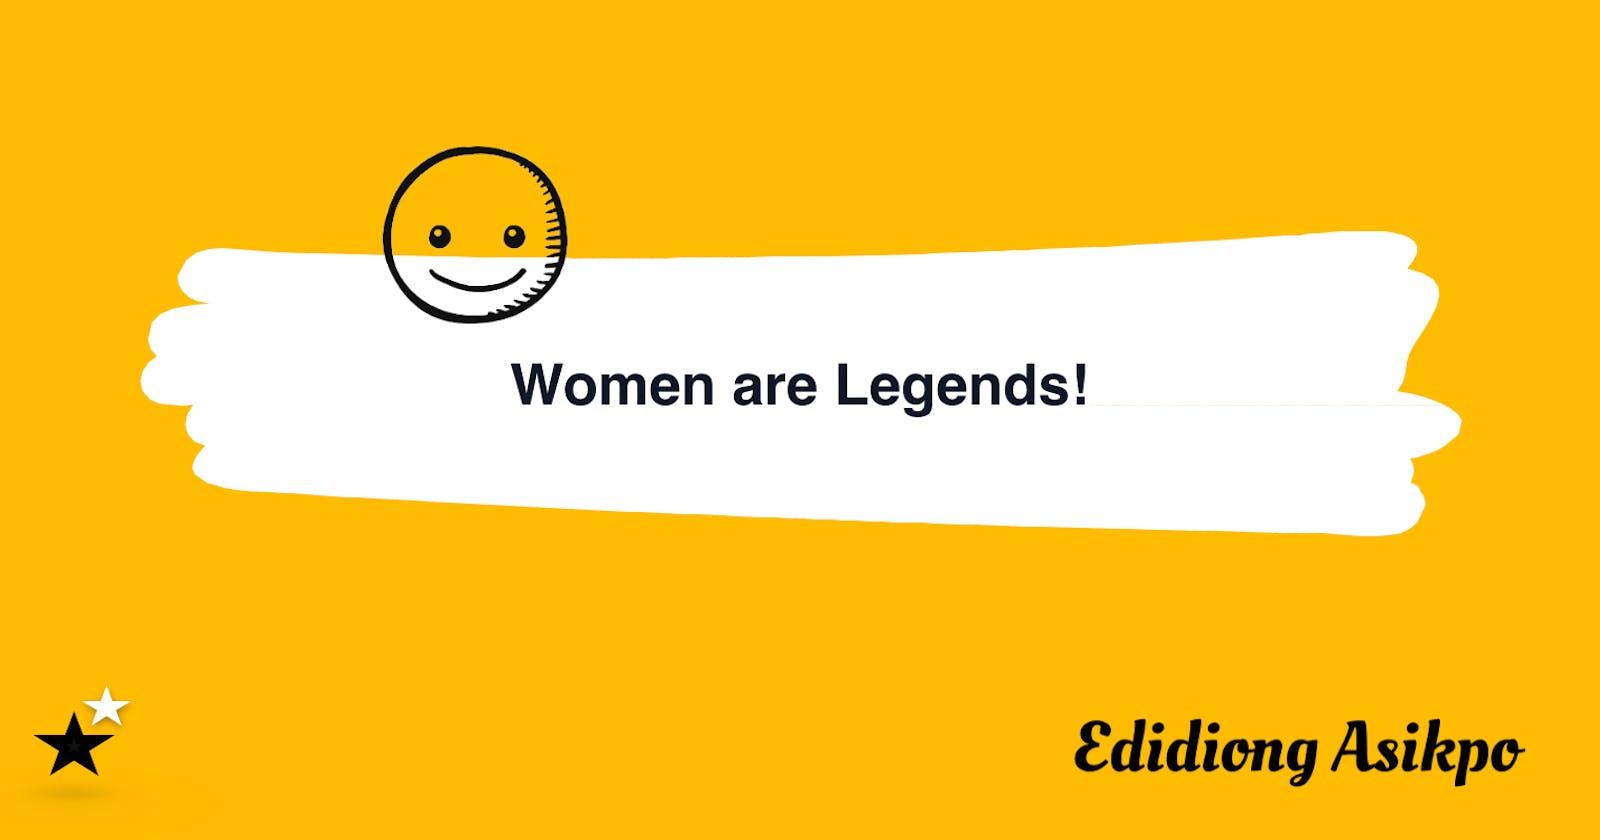 Women are Legends!